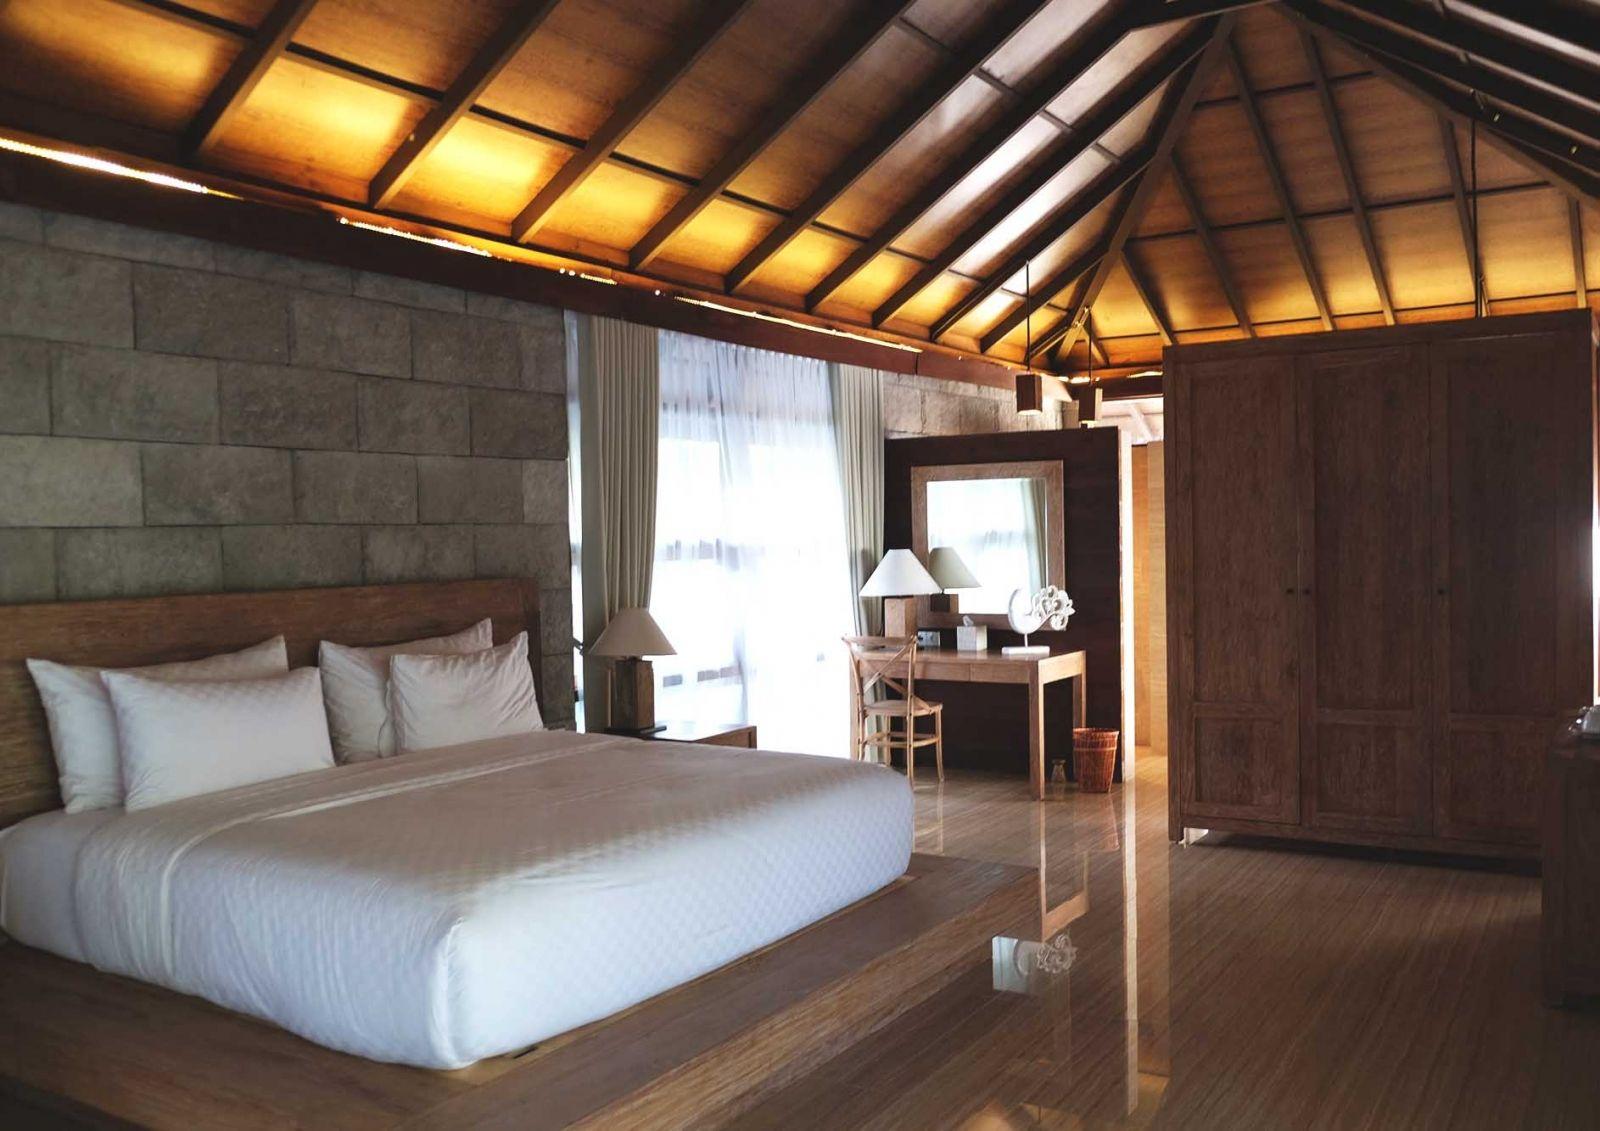 Arumdalu Private Resort  Arumdalu Private Resort